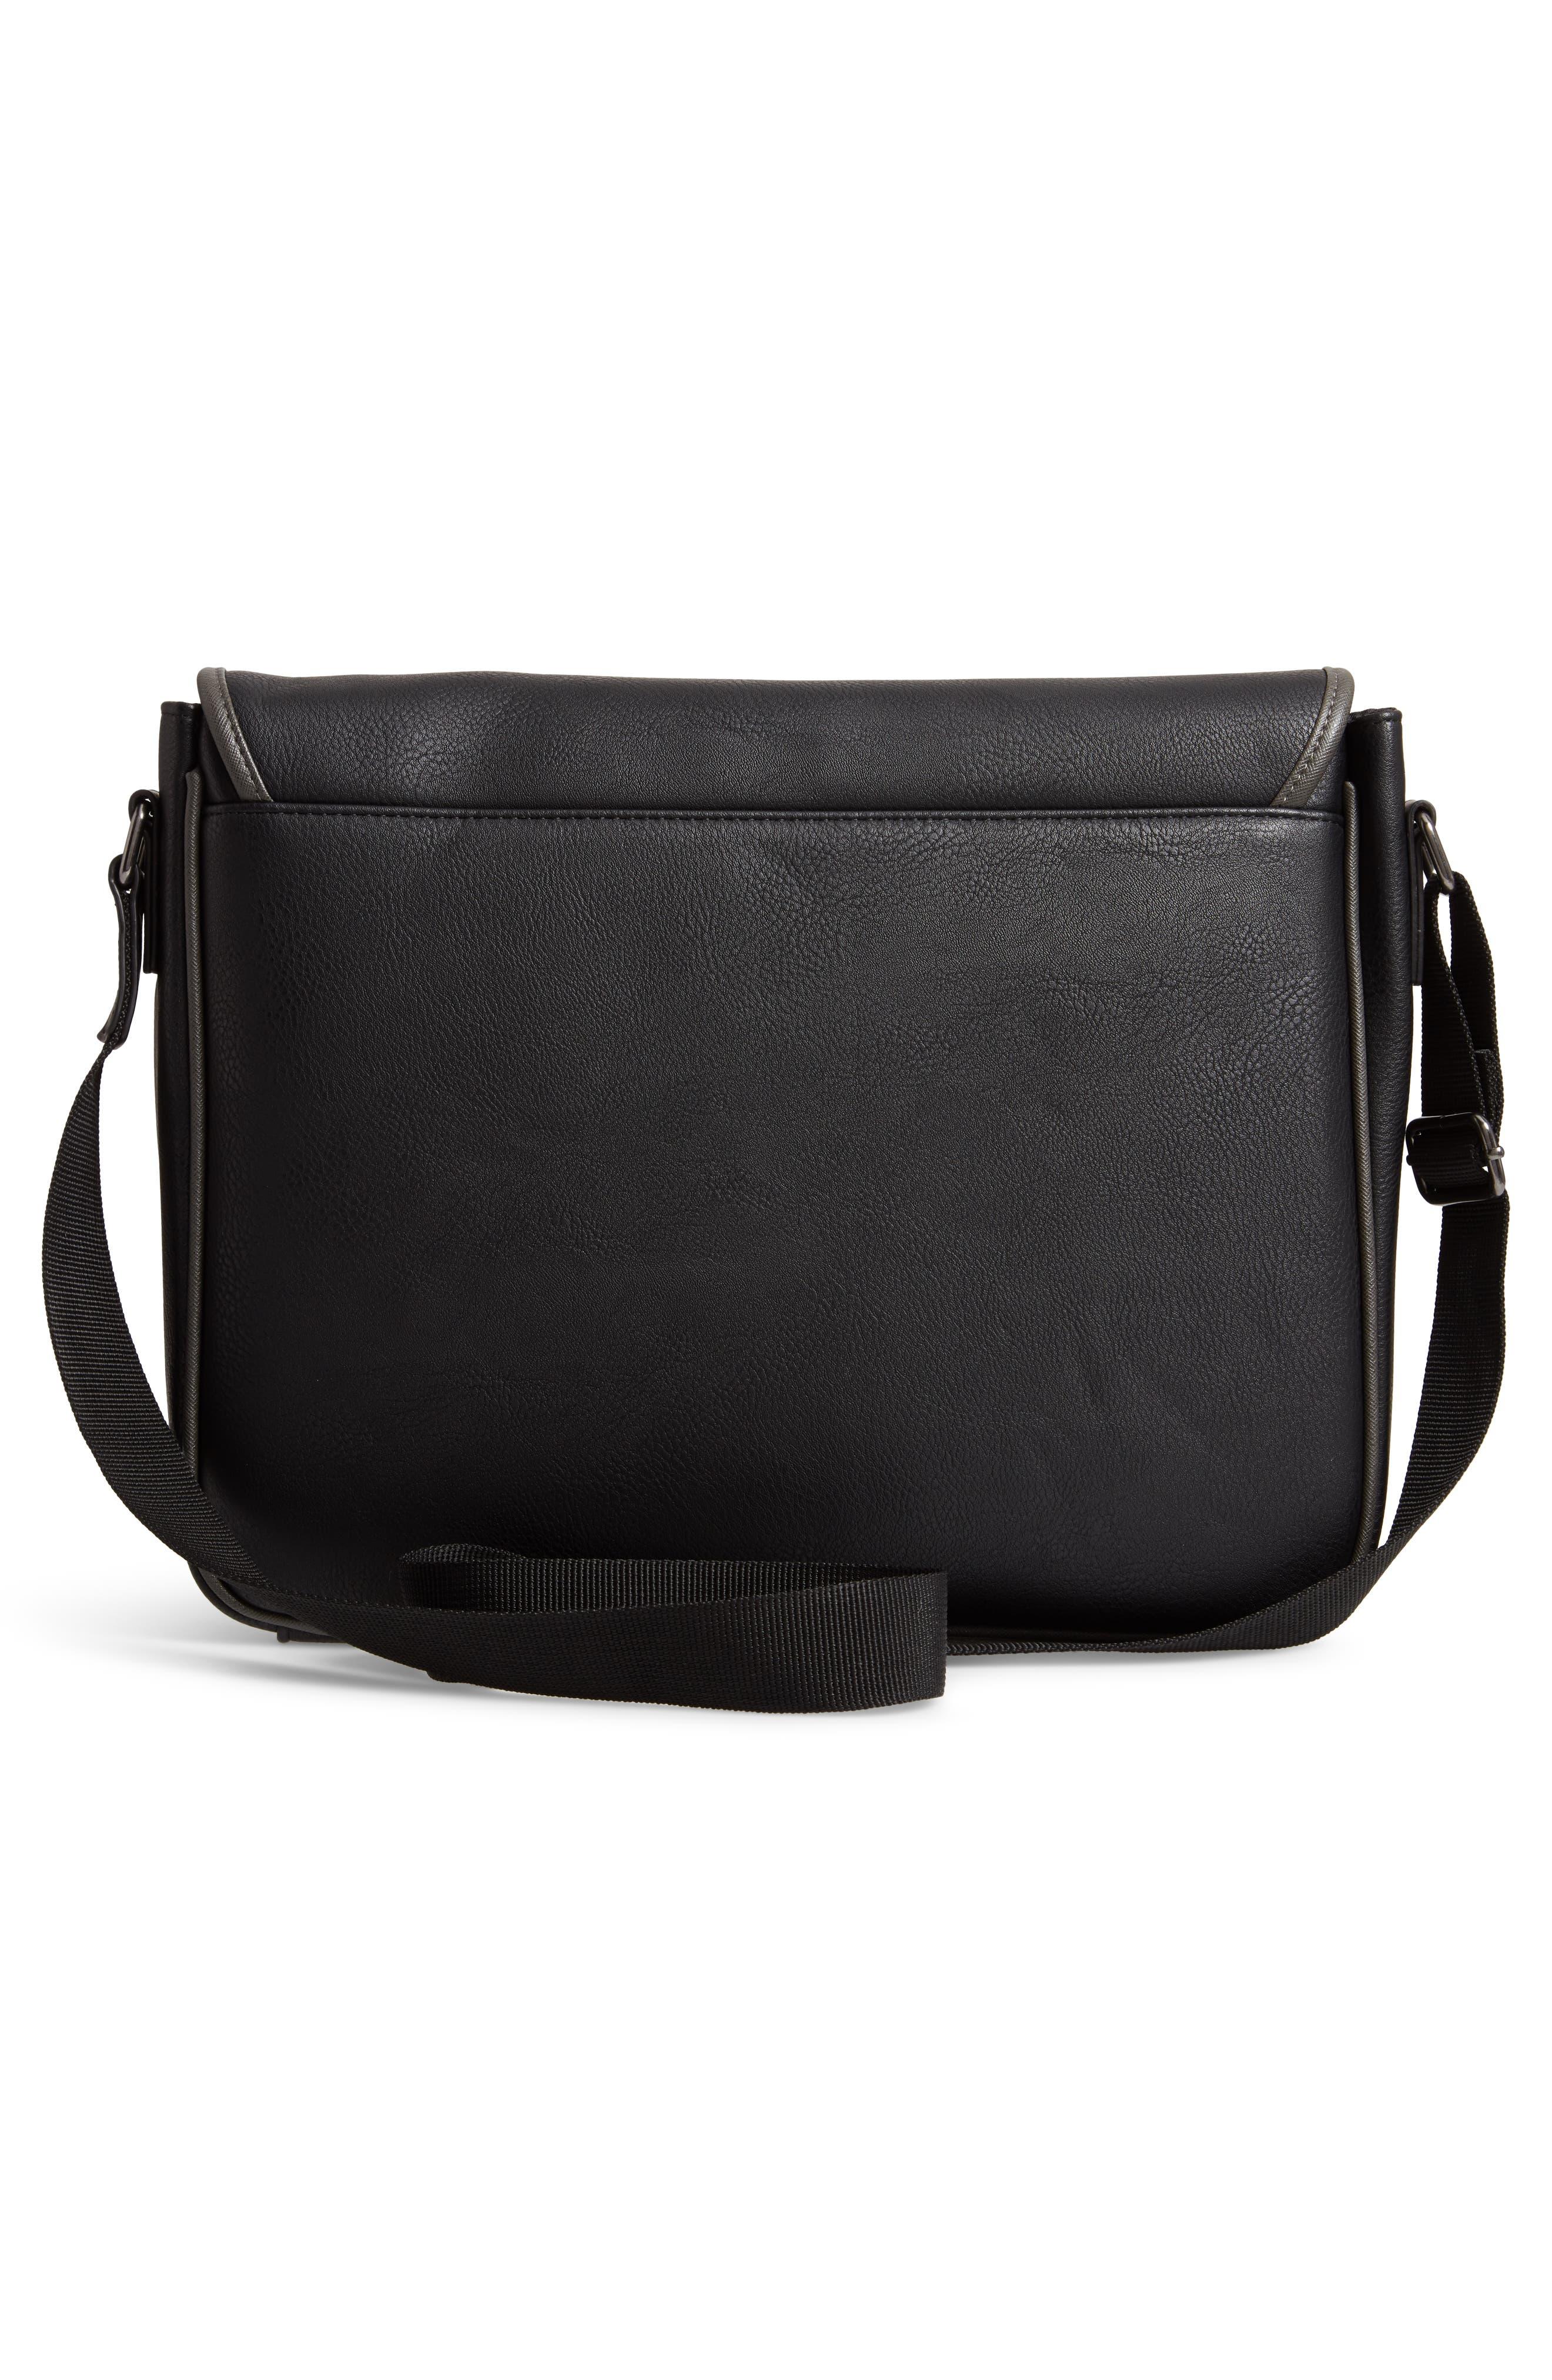 Kingcol Faux Leather Messenger Bag,                             Alternate thumbnail 3, color,                             Black